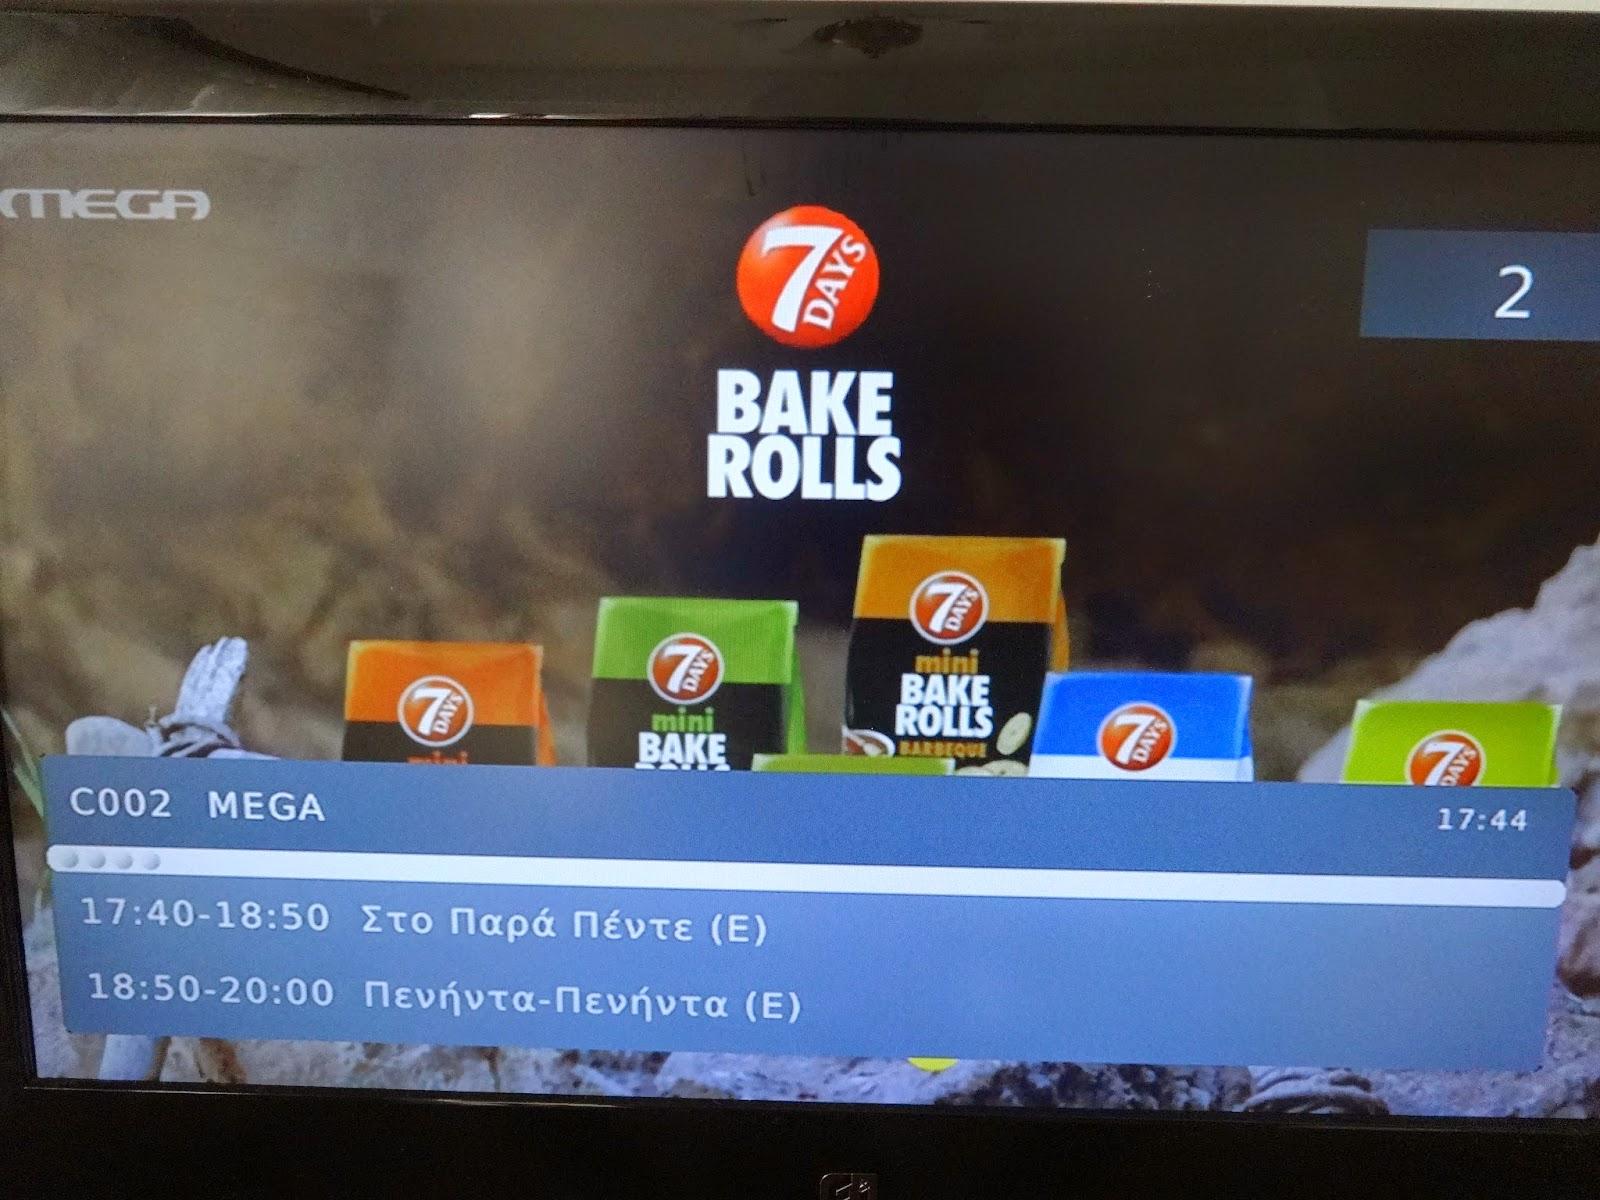 875075f12f56 Όχι σαν τα μεγάλα κανάλια που διαφημίζουν προϊόντα όπως τα bake rolls